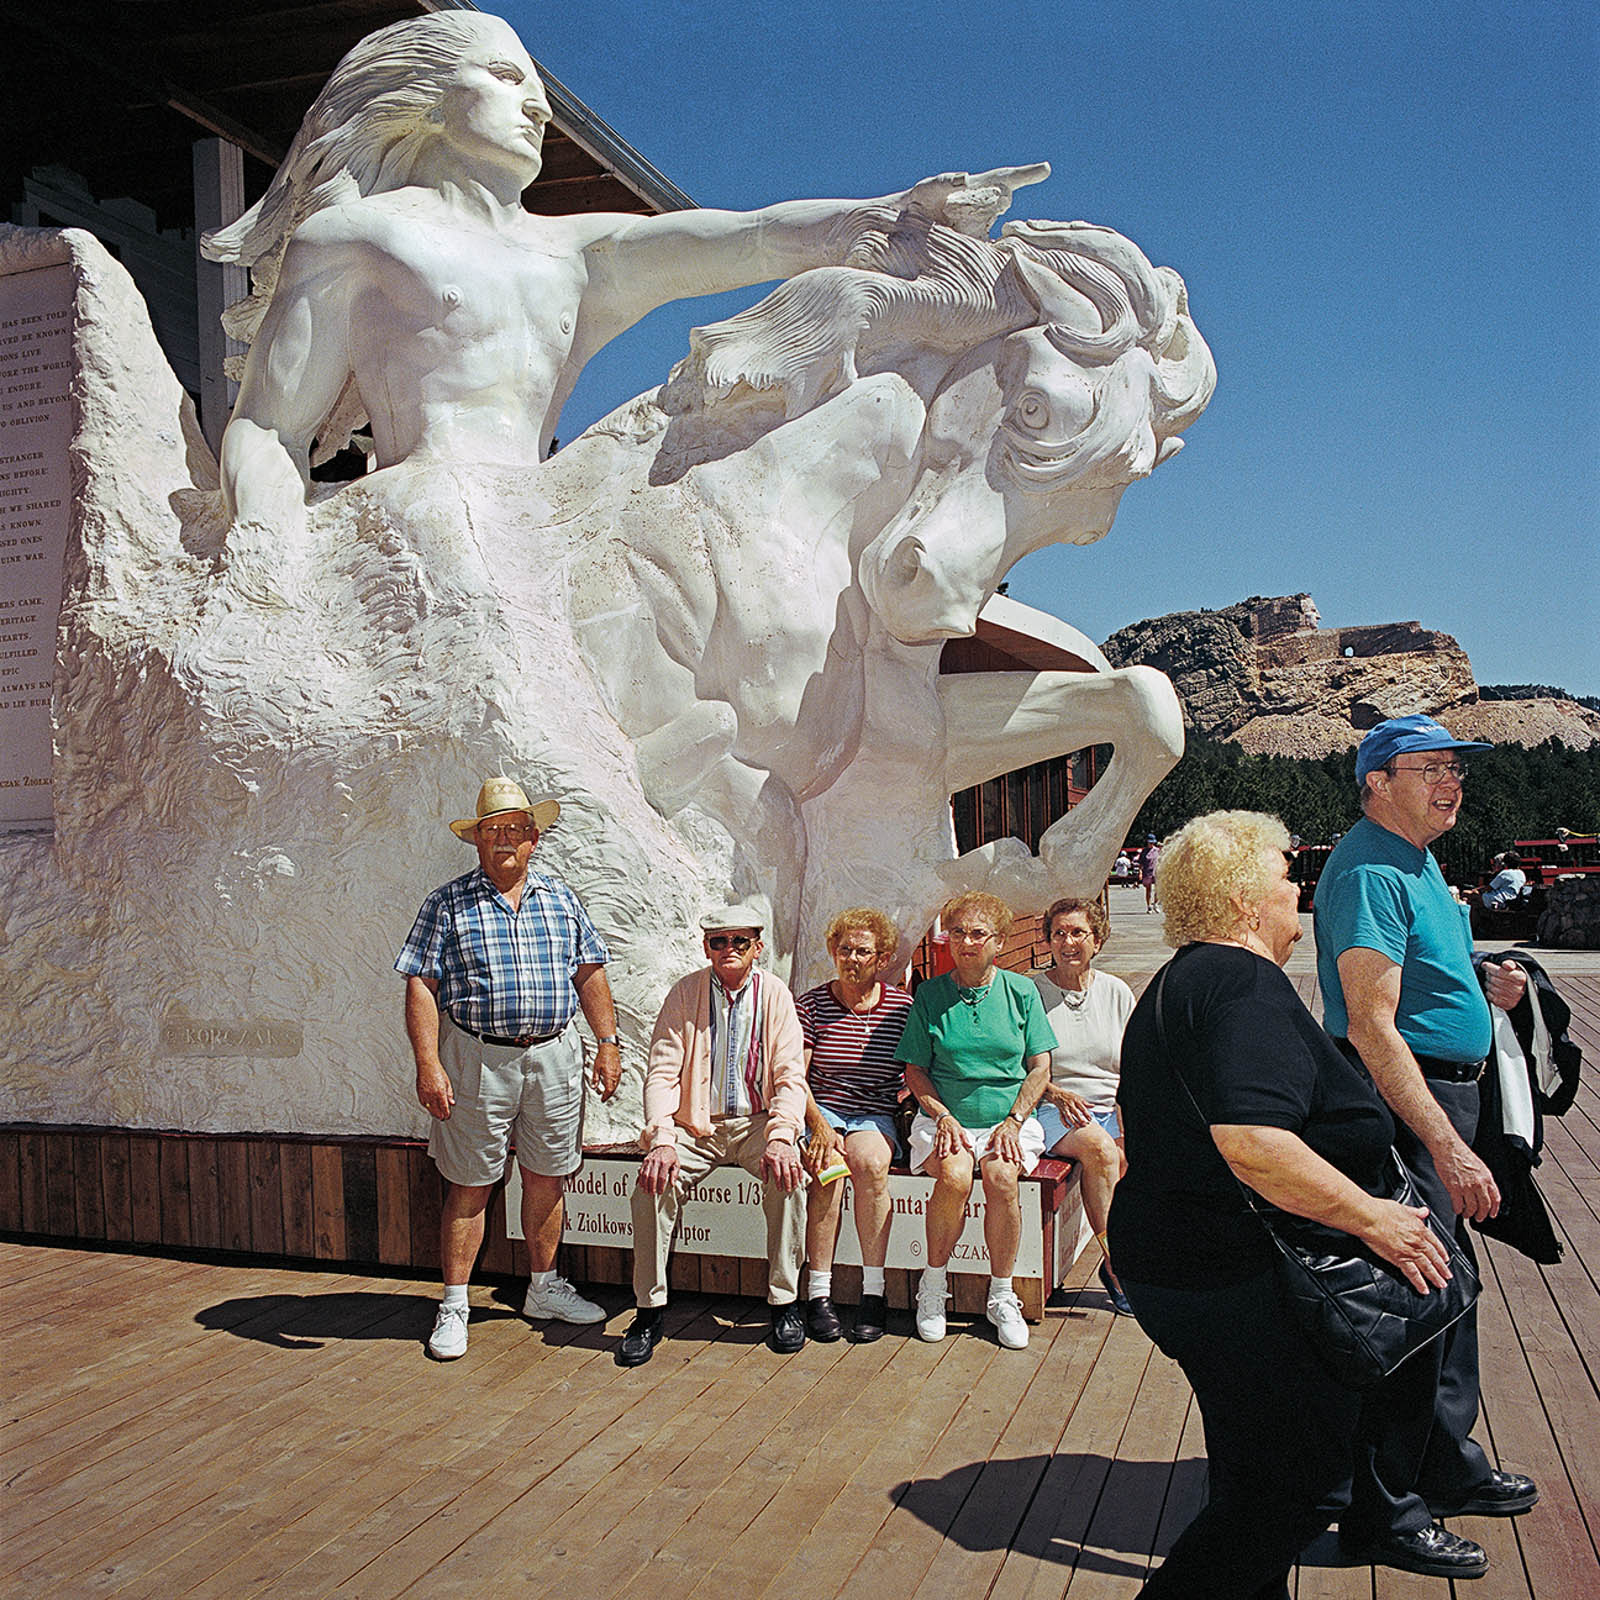 Visitors at Gift Shop, Crazy Horse National Monument, South Dakota 1999